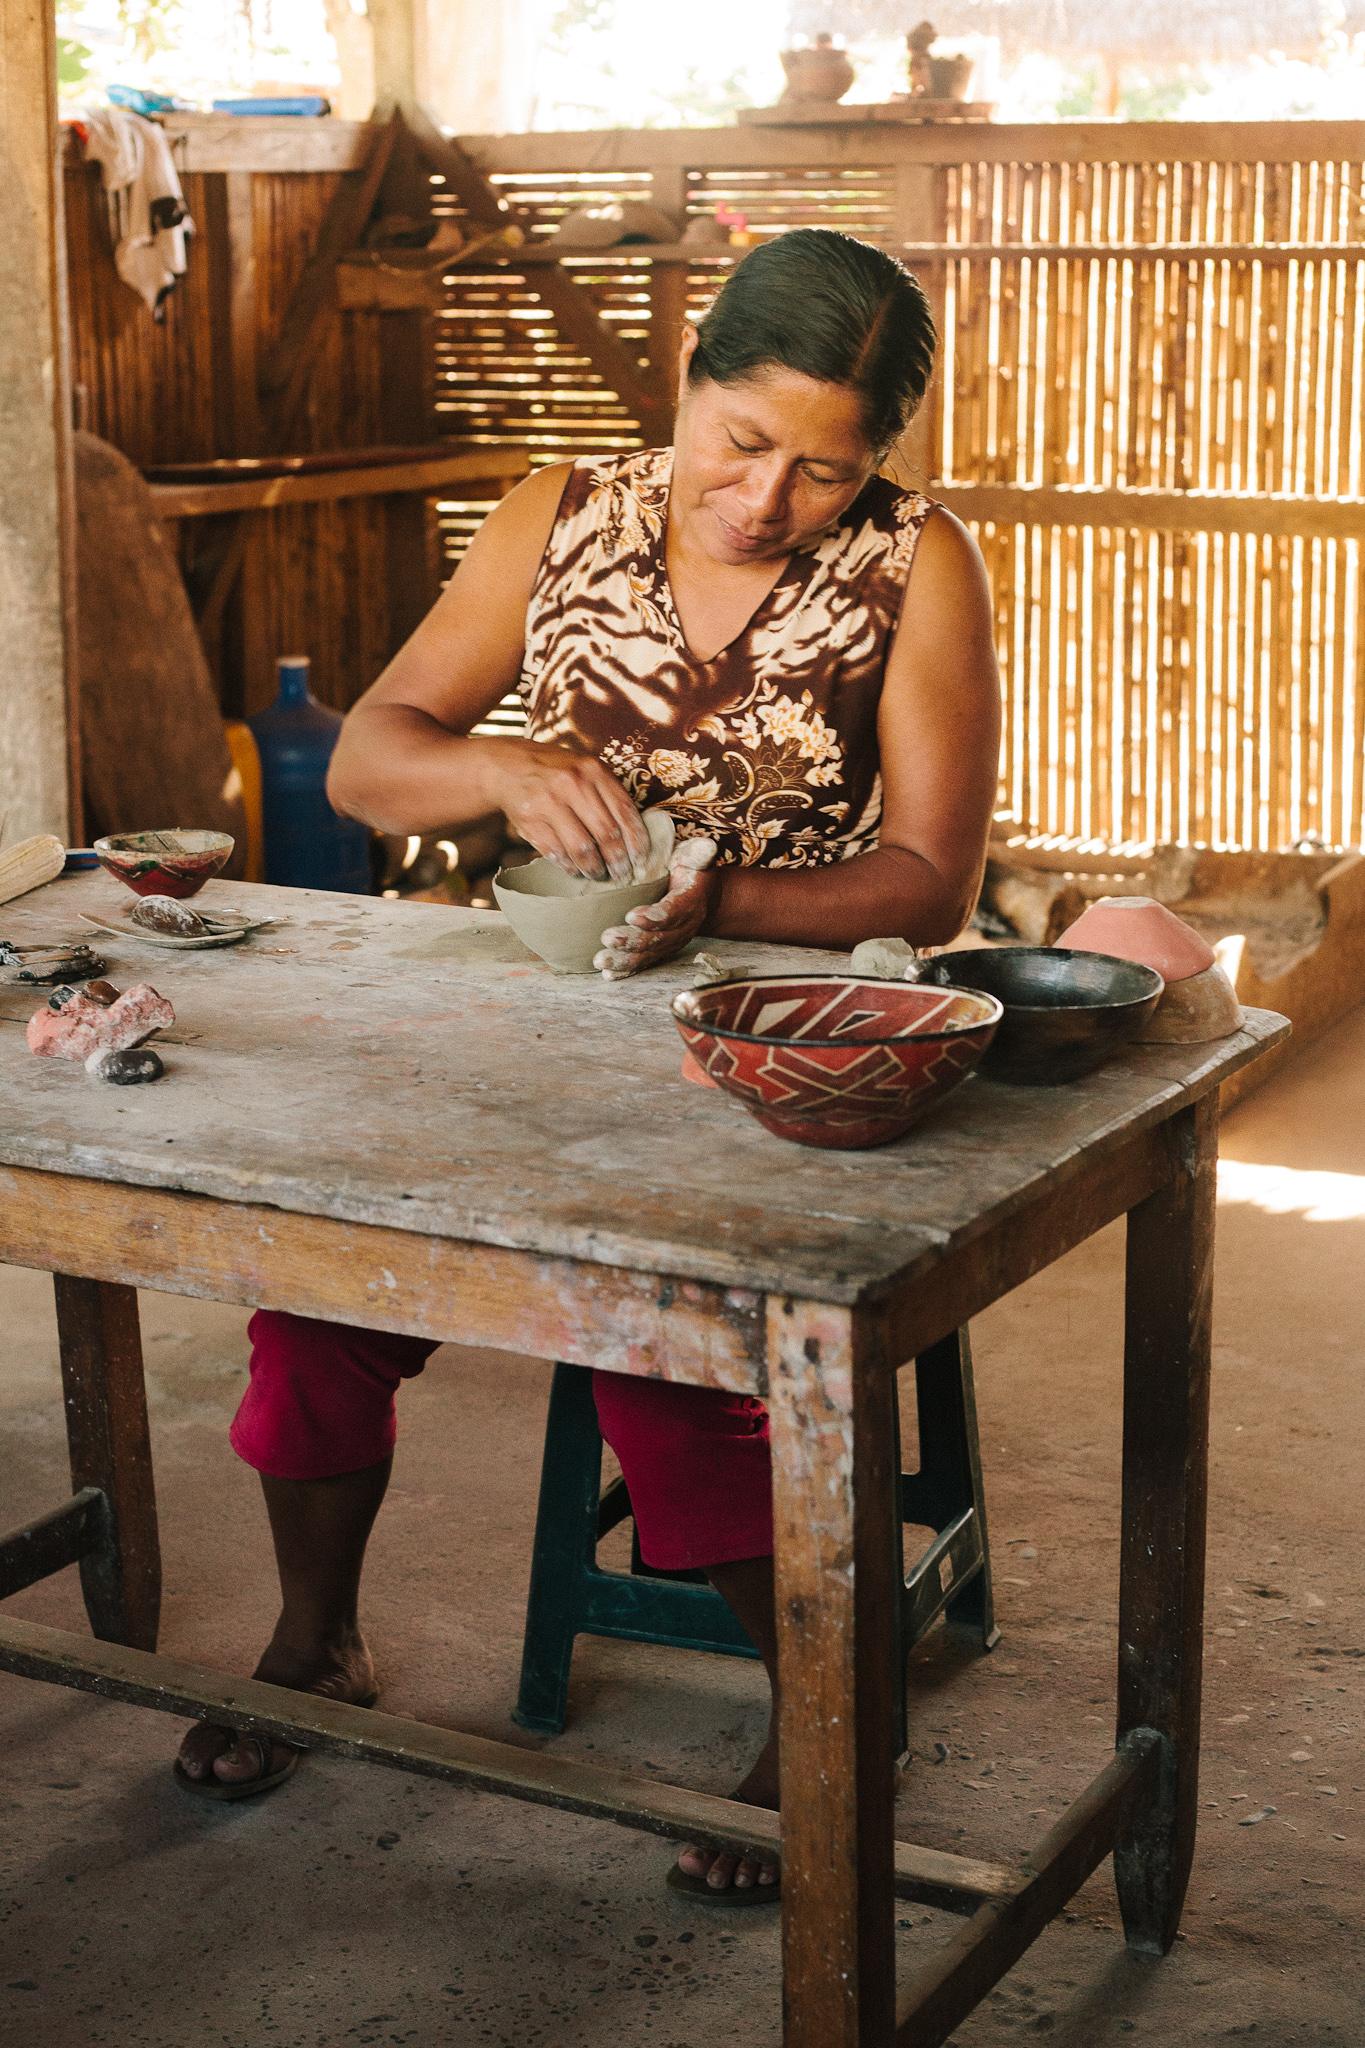 EcuadorQuito&Amazon_forwebsite2015_Jan2010_jenniferleahy-036.jpg